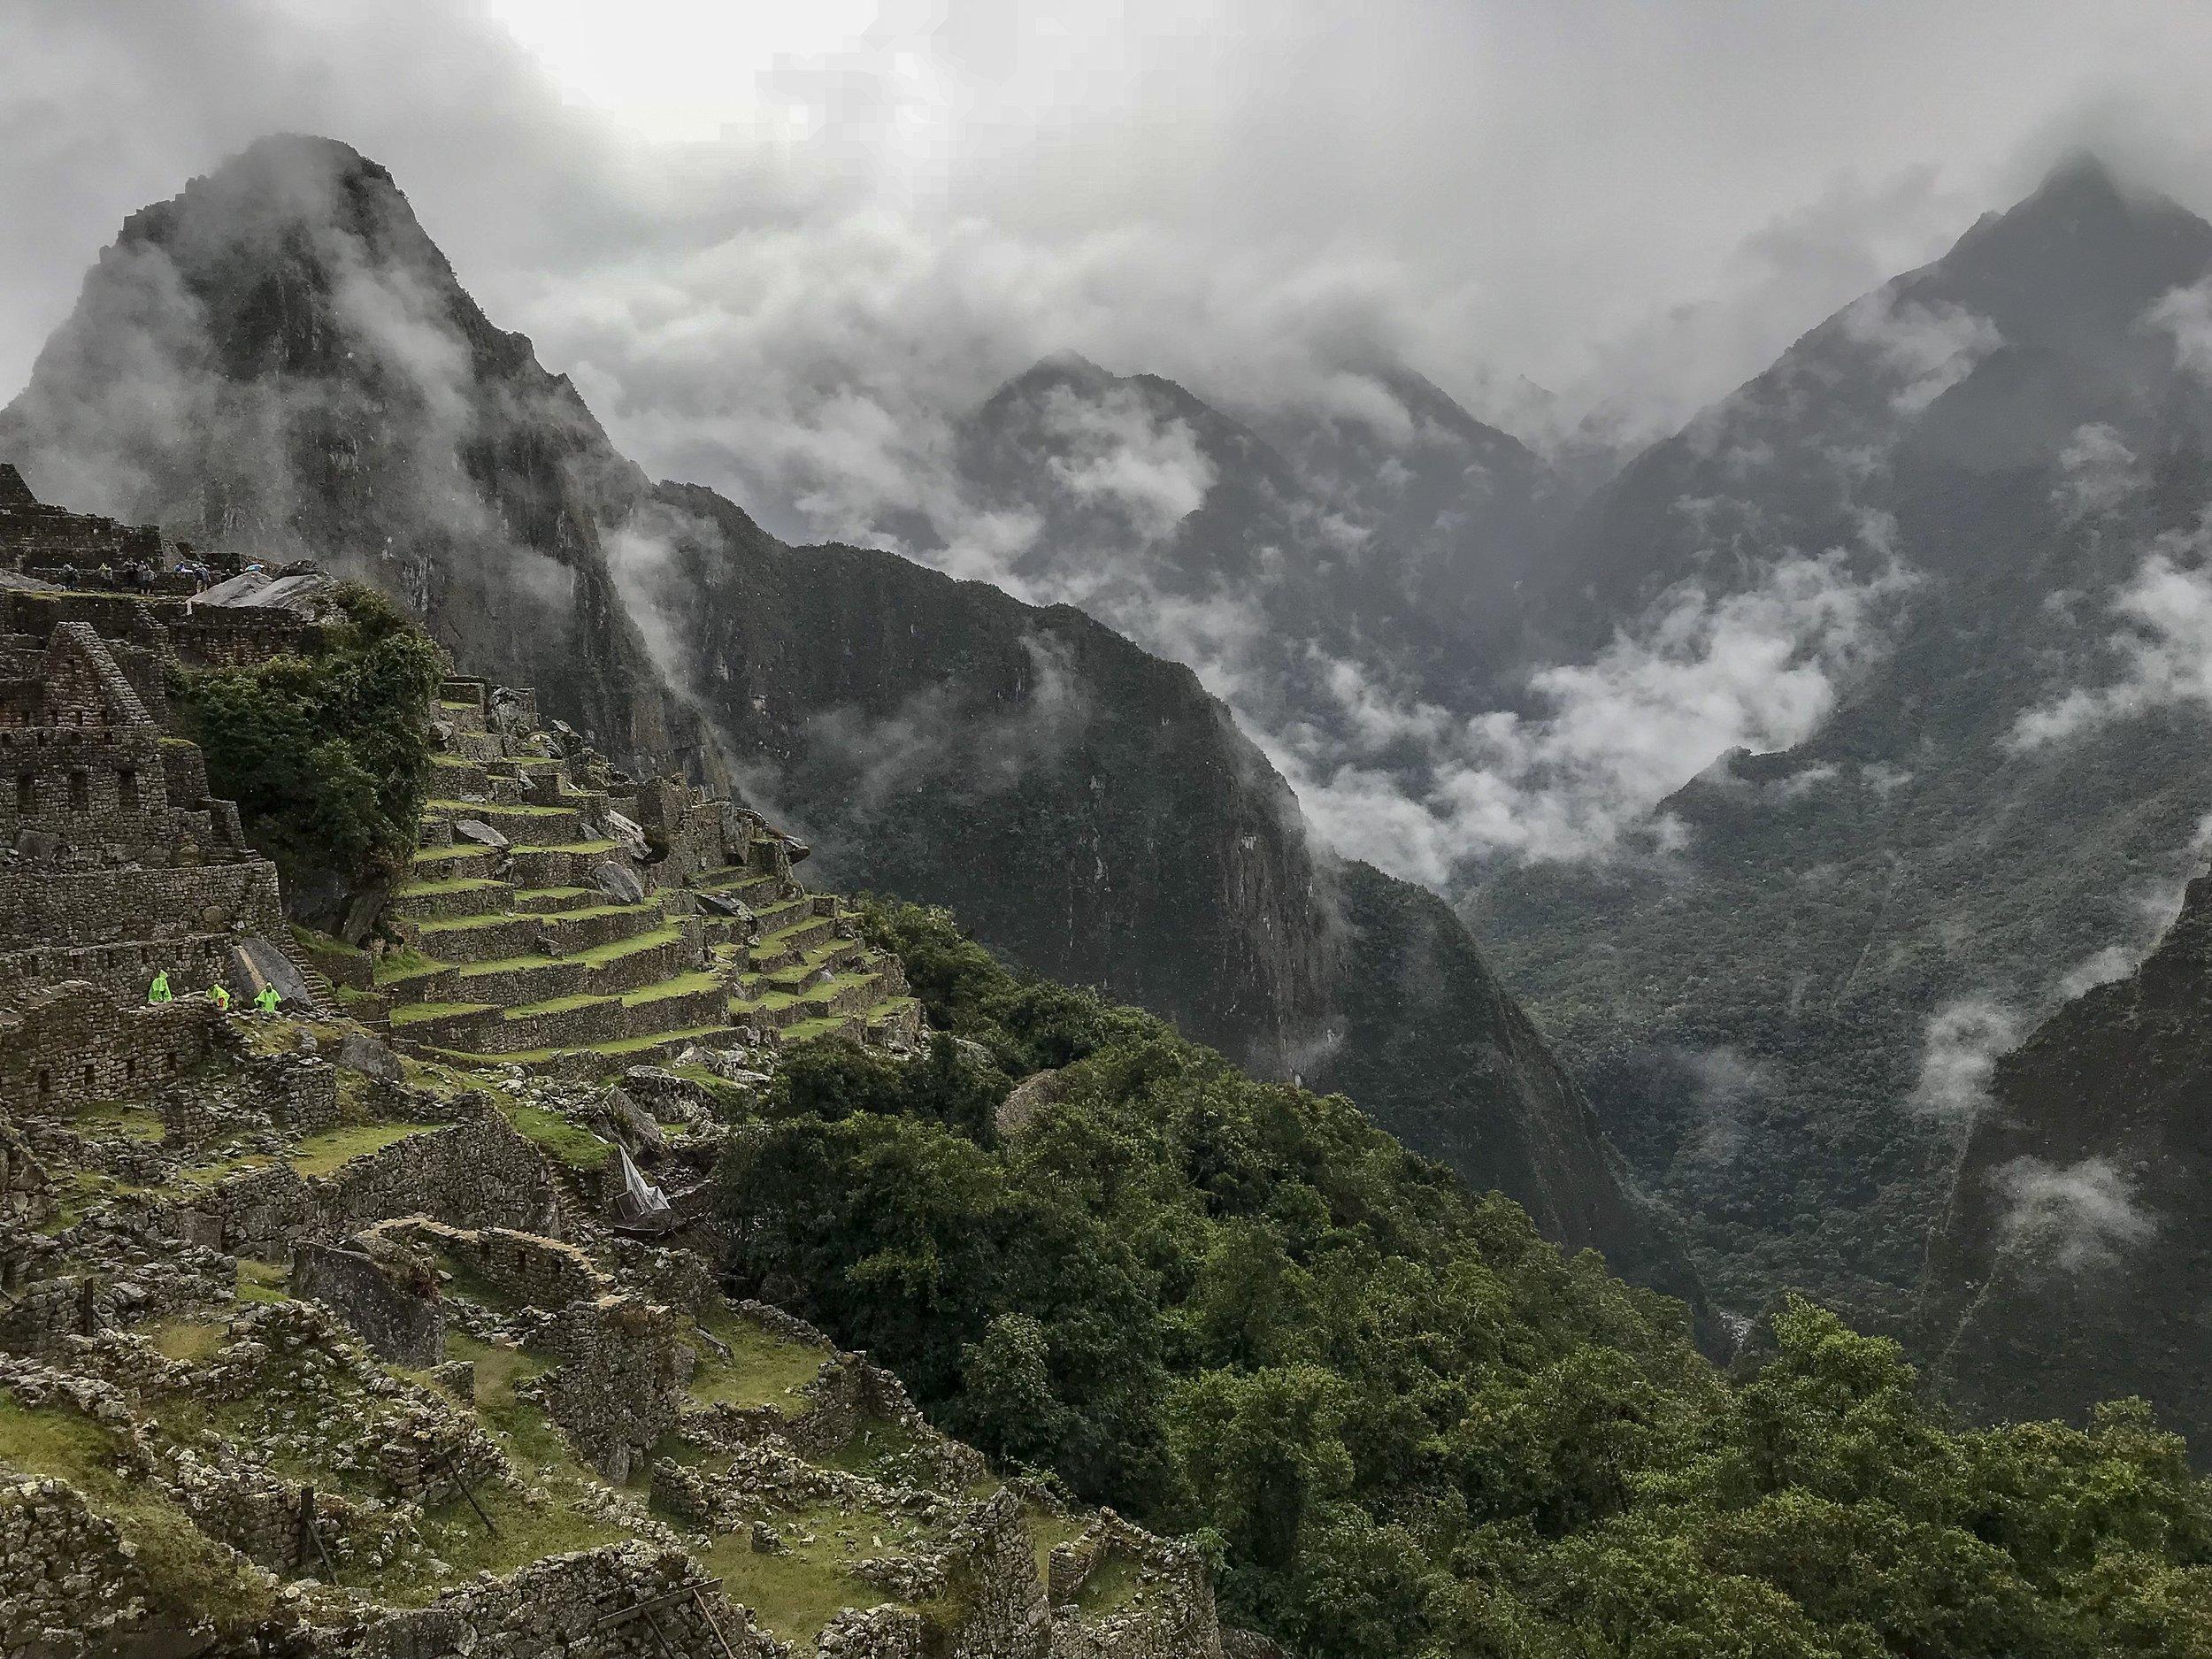 Machu Picchu and Mountains